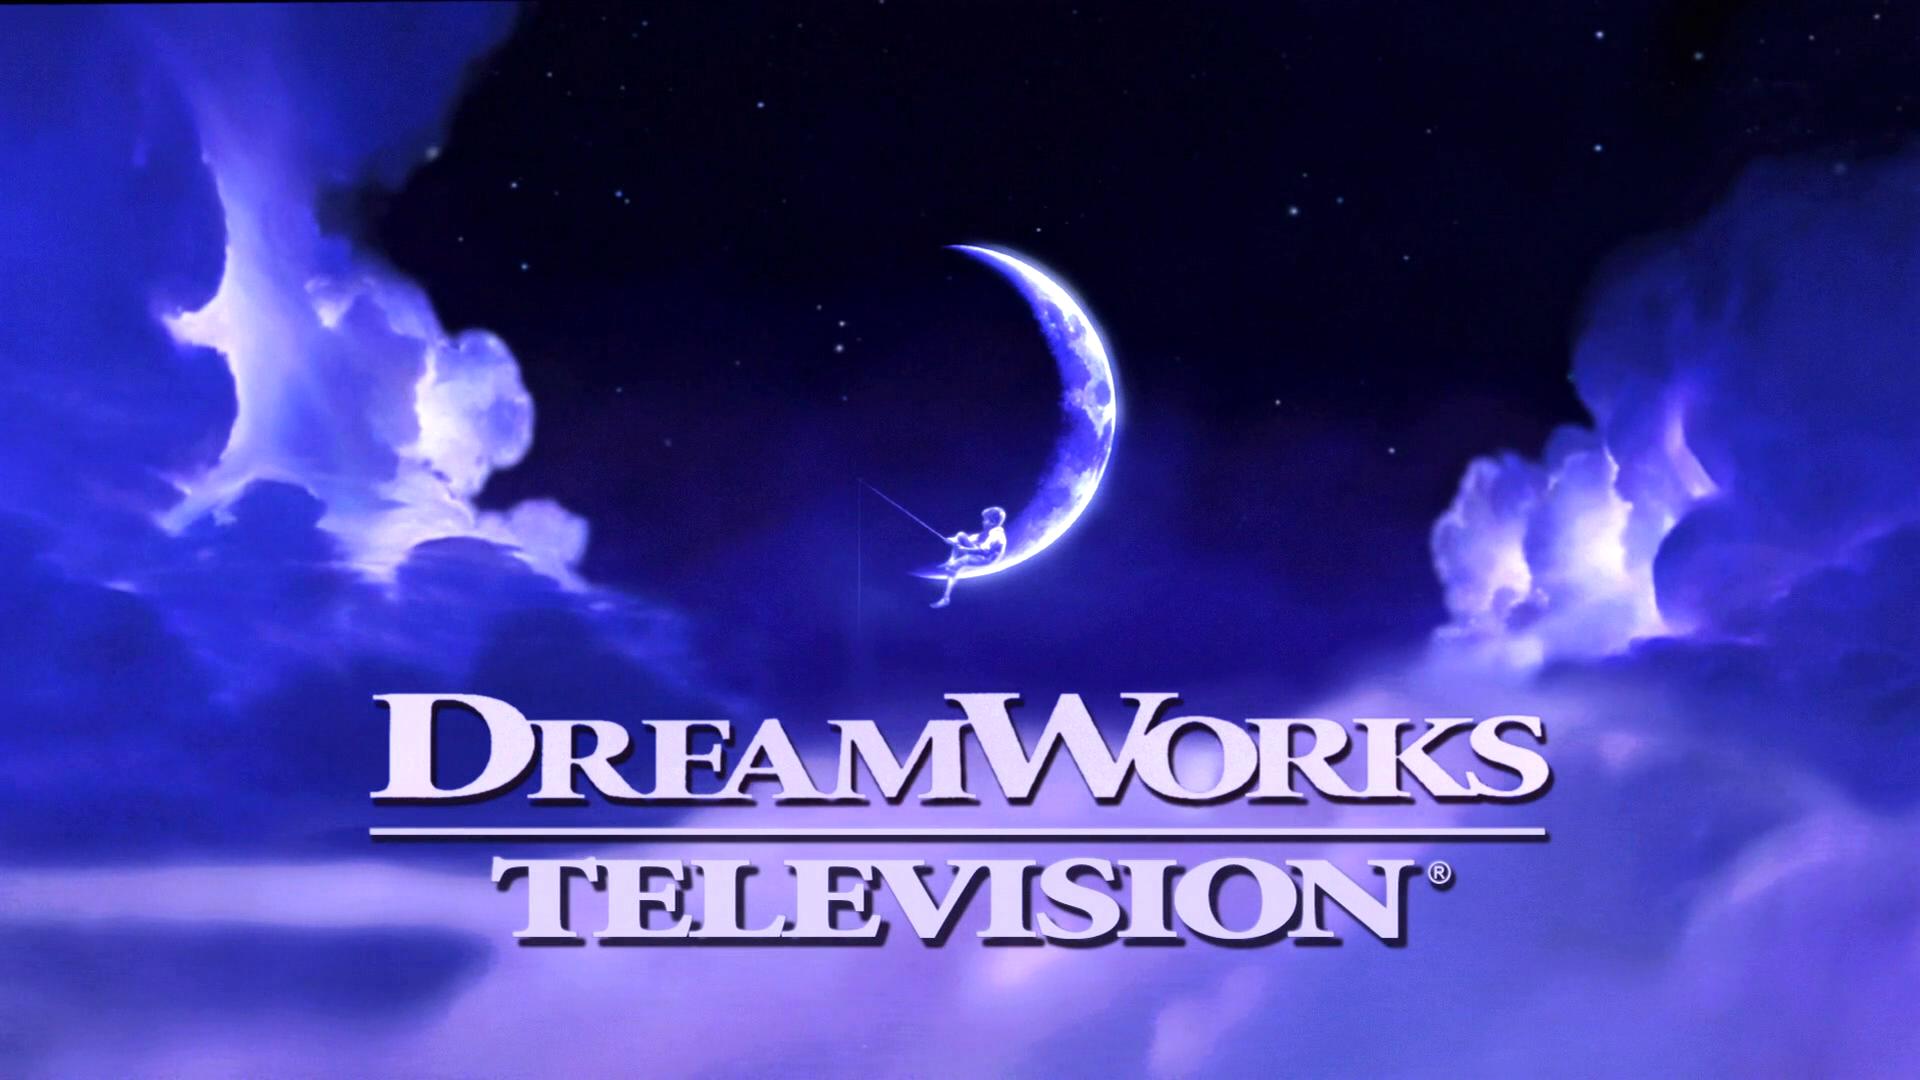 Dreamworks television logopedia wikia